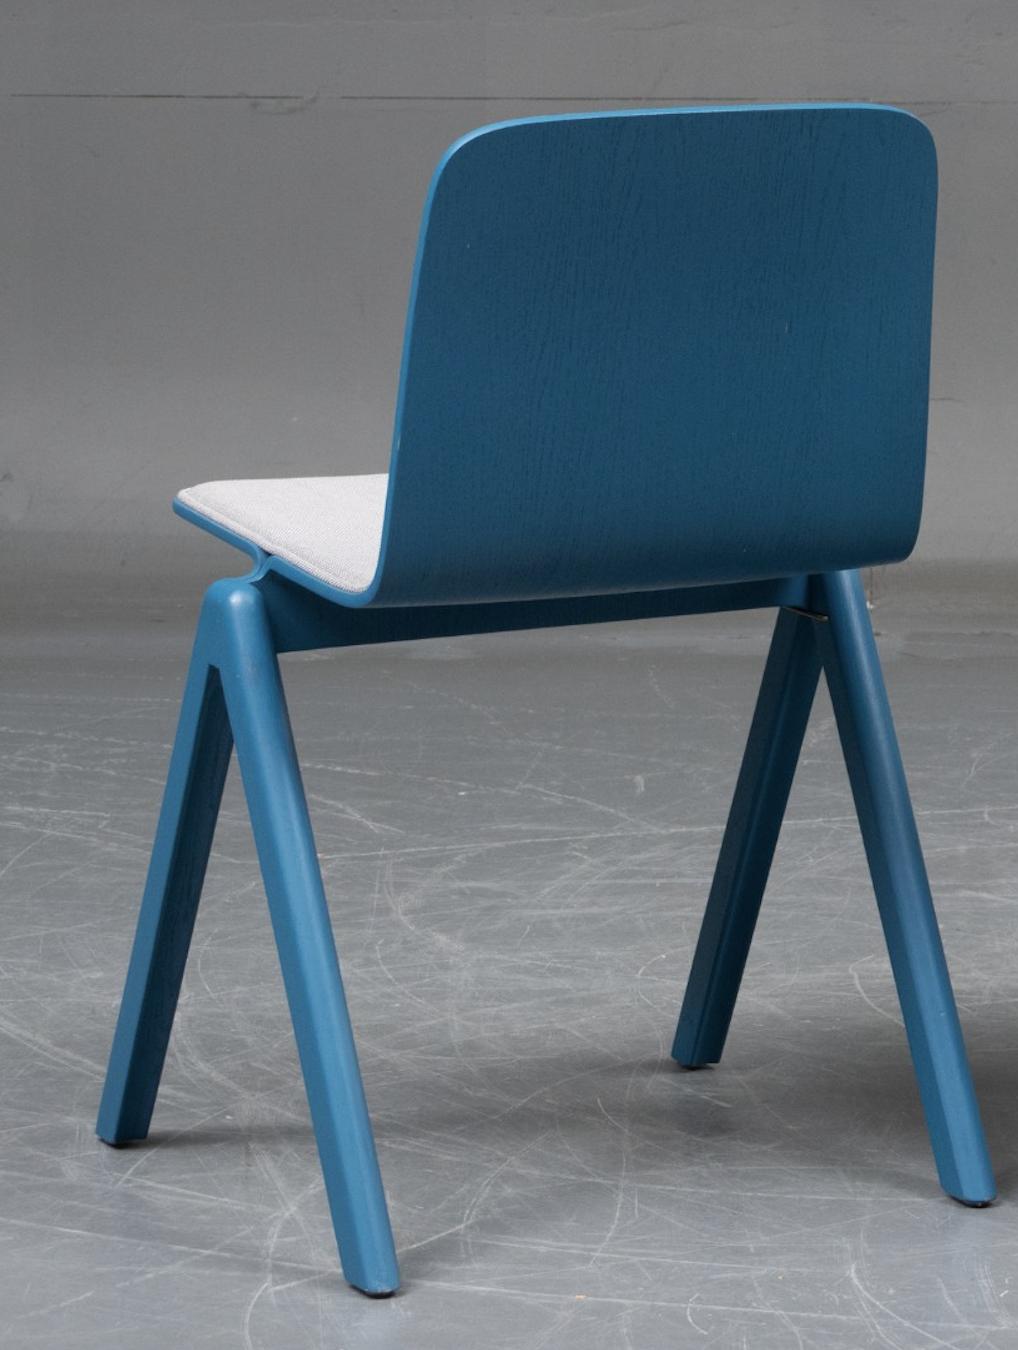 HAY COPENHAGUE Chair, Design by Ronan und Erwan BOUROULLEC, gepolstert